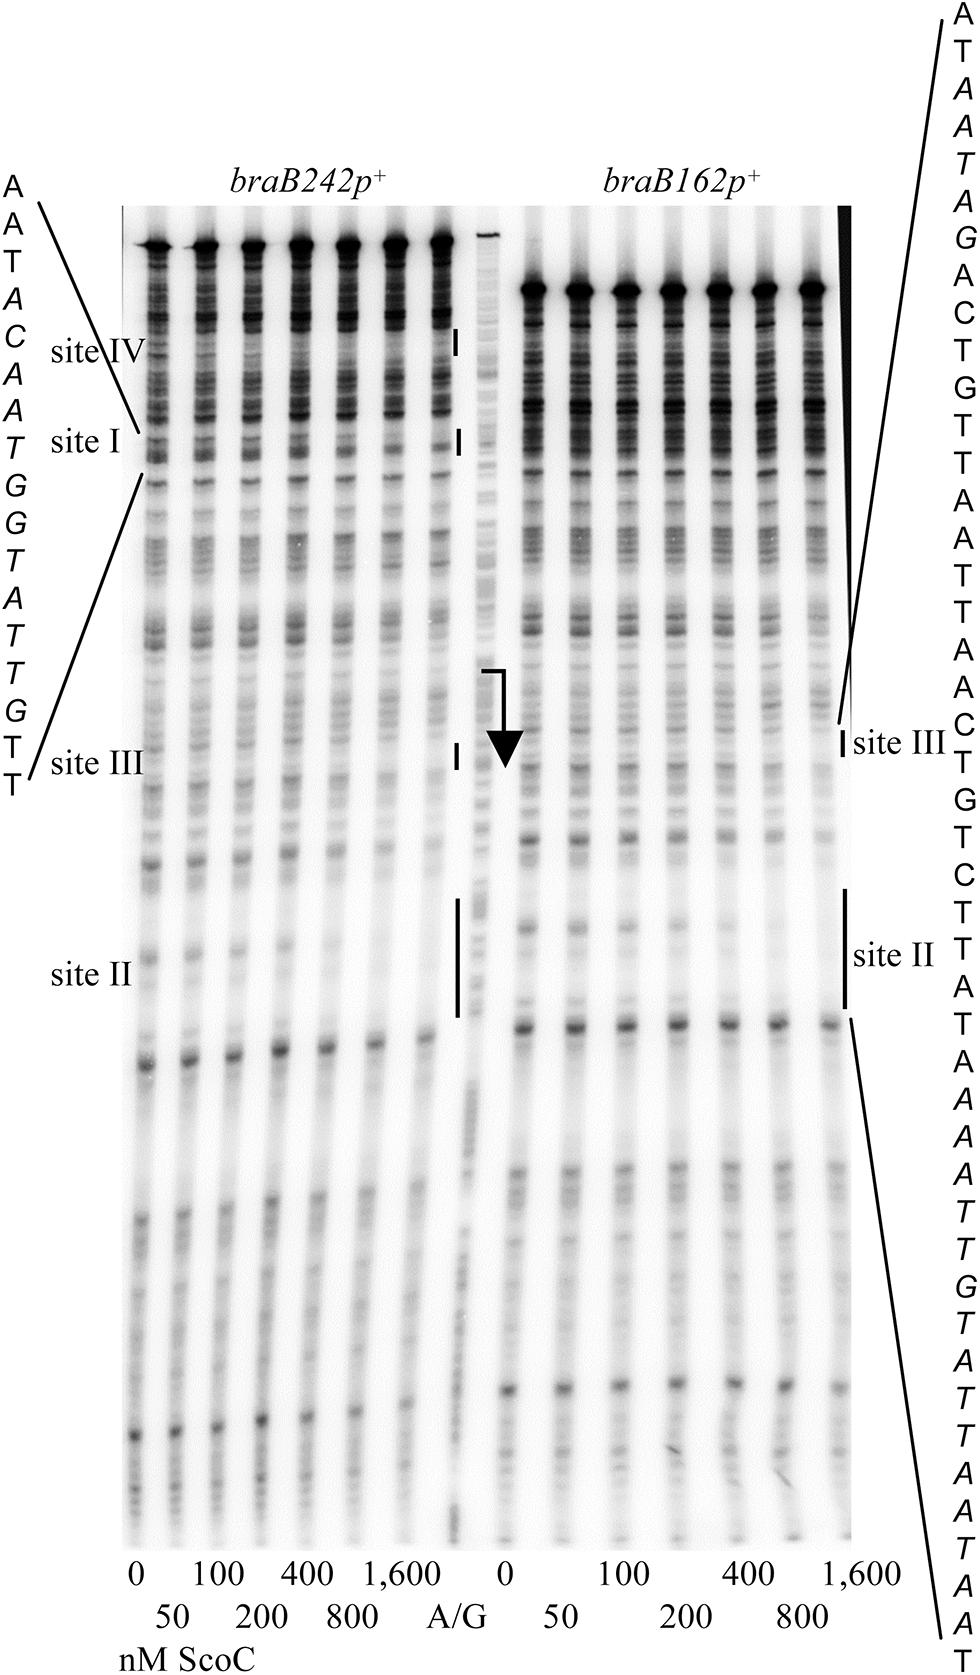 Determination of <i>braB</i> ScoC-binding regions.